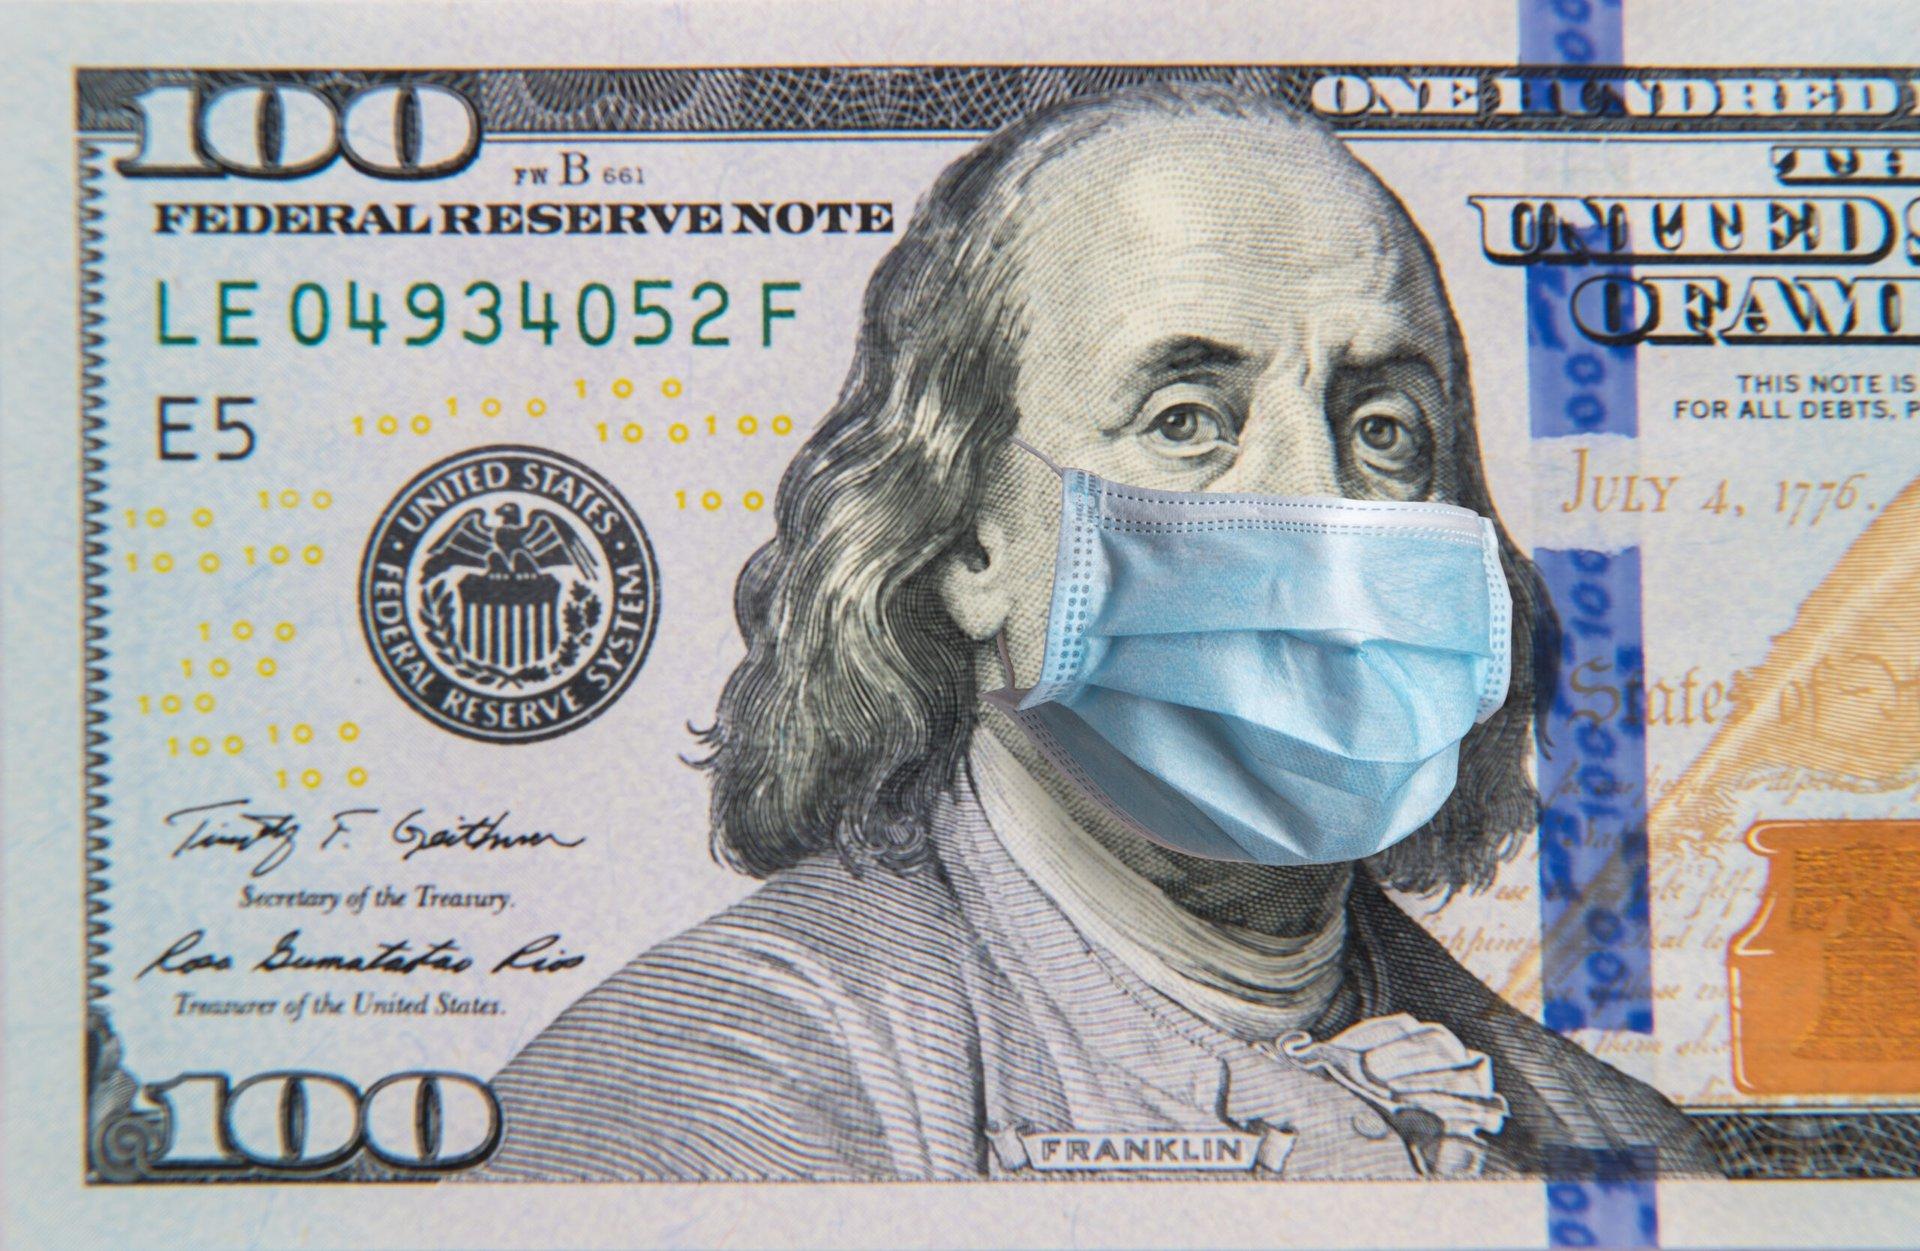 Benjamin Franklin in a mask on a $100 bill